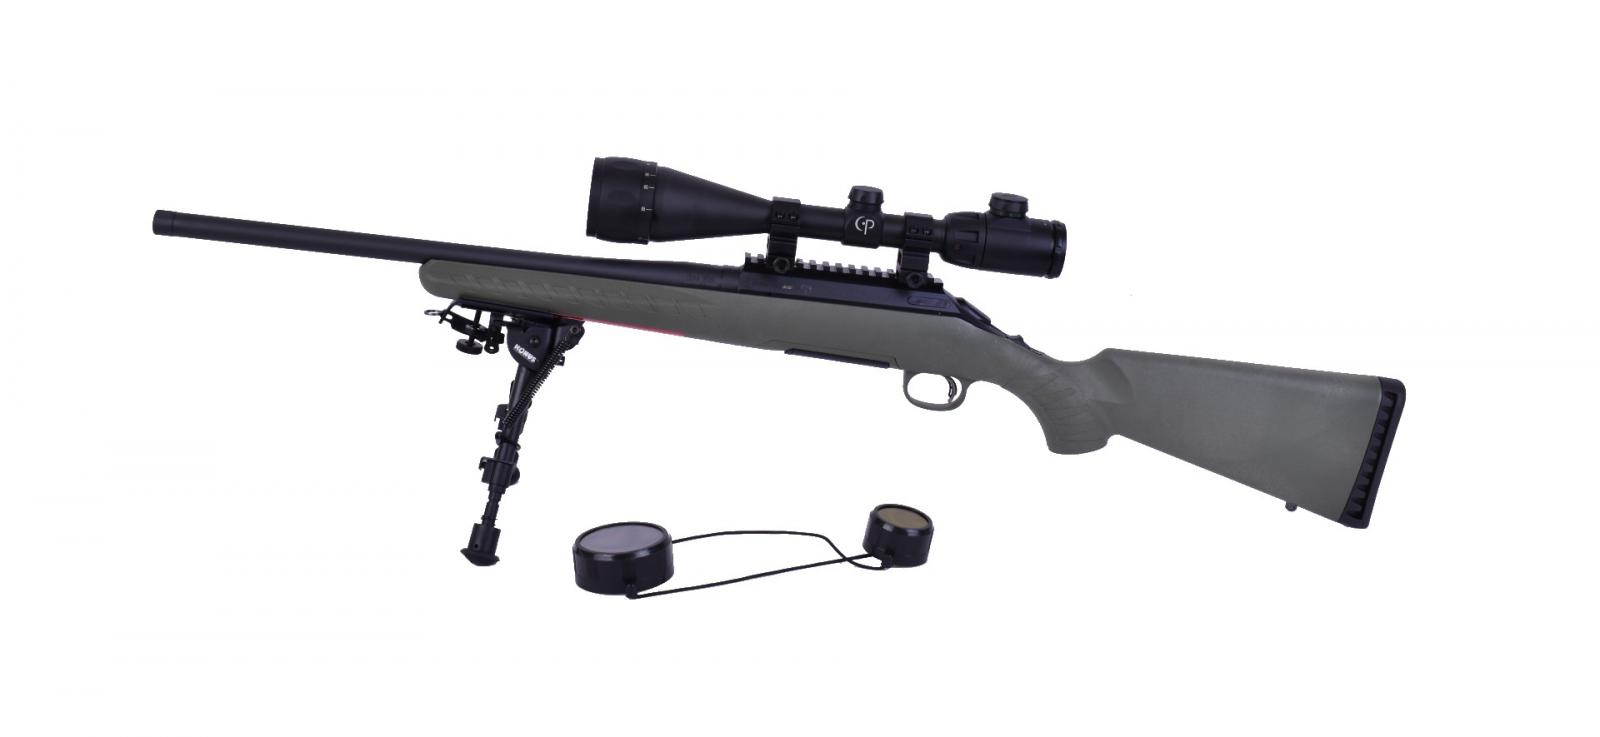 Pack Carabine Ruger American Rifle Predator Fileté + Bipied + Lunette CP6x20x50